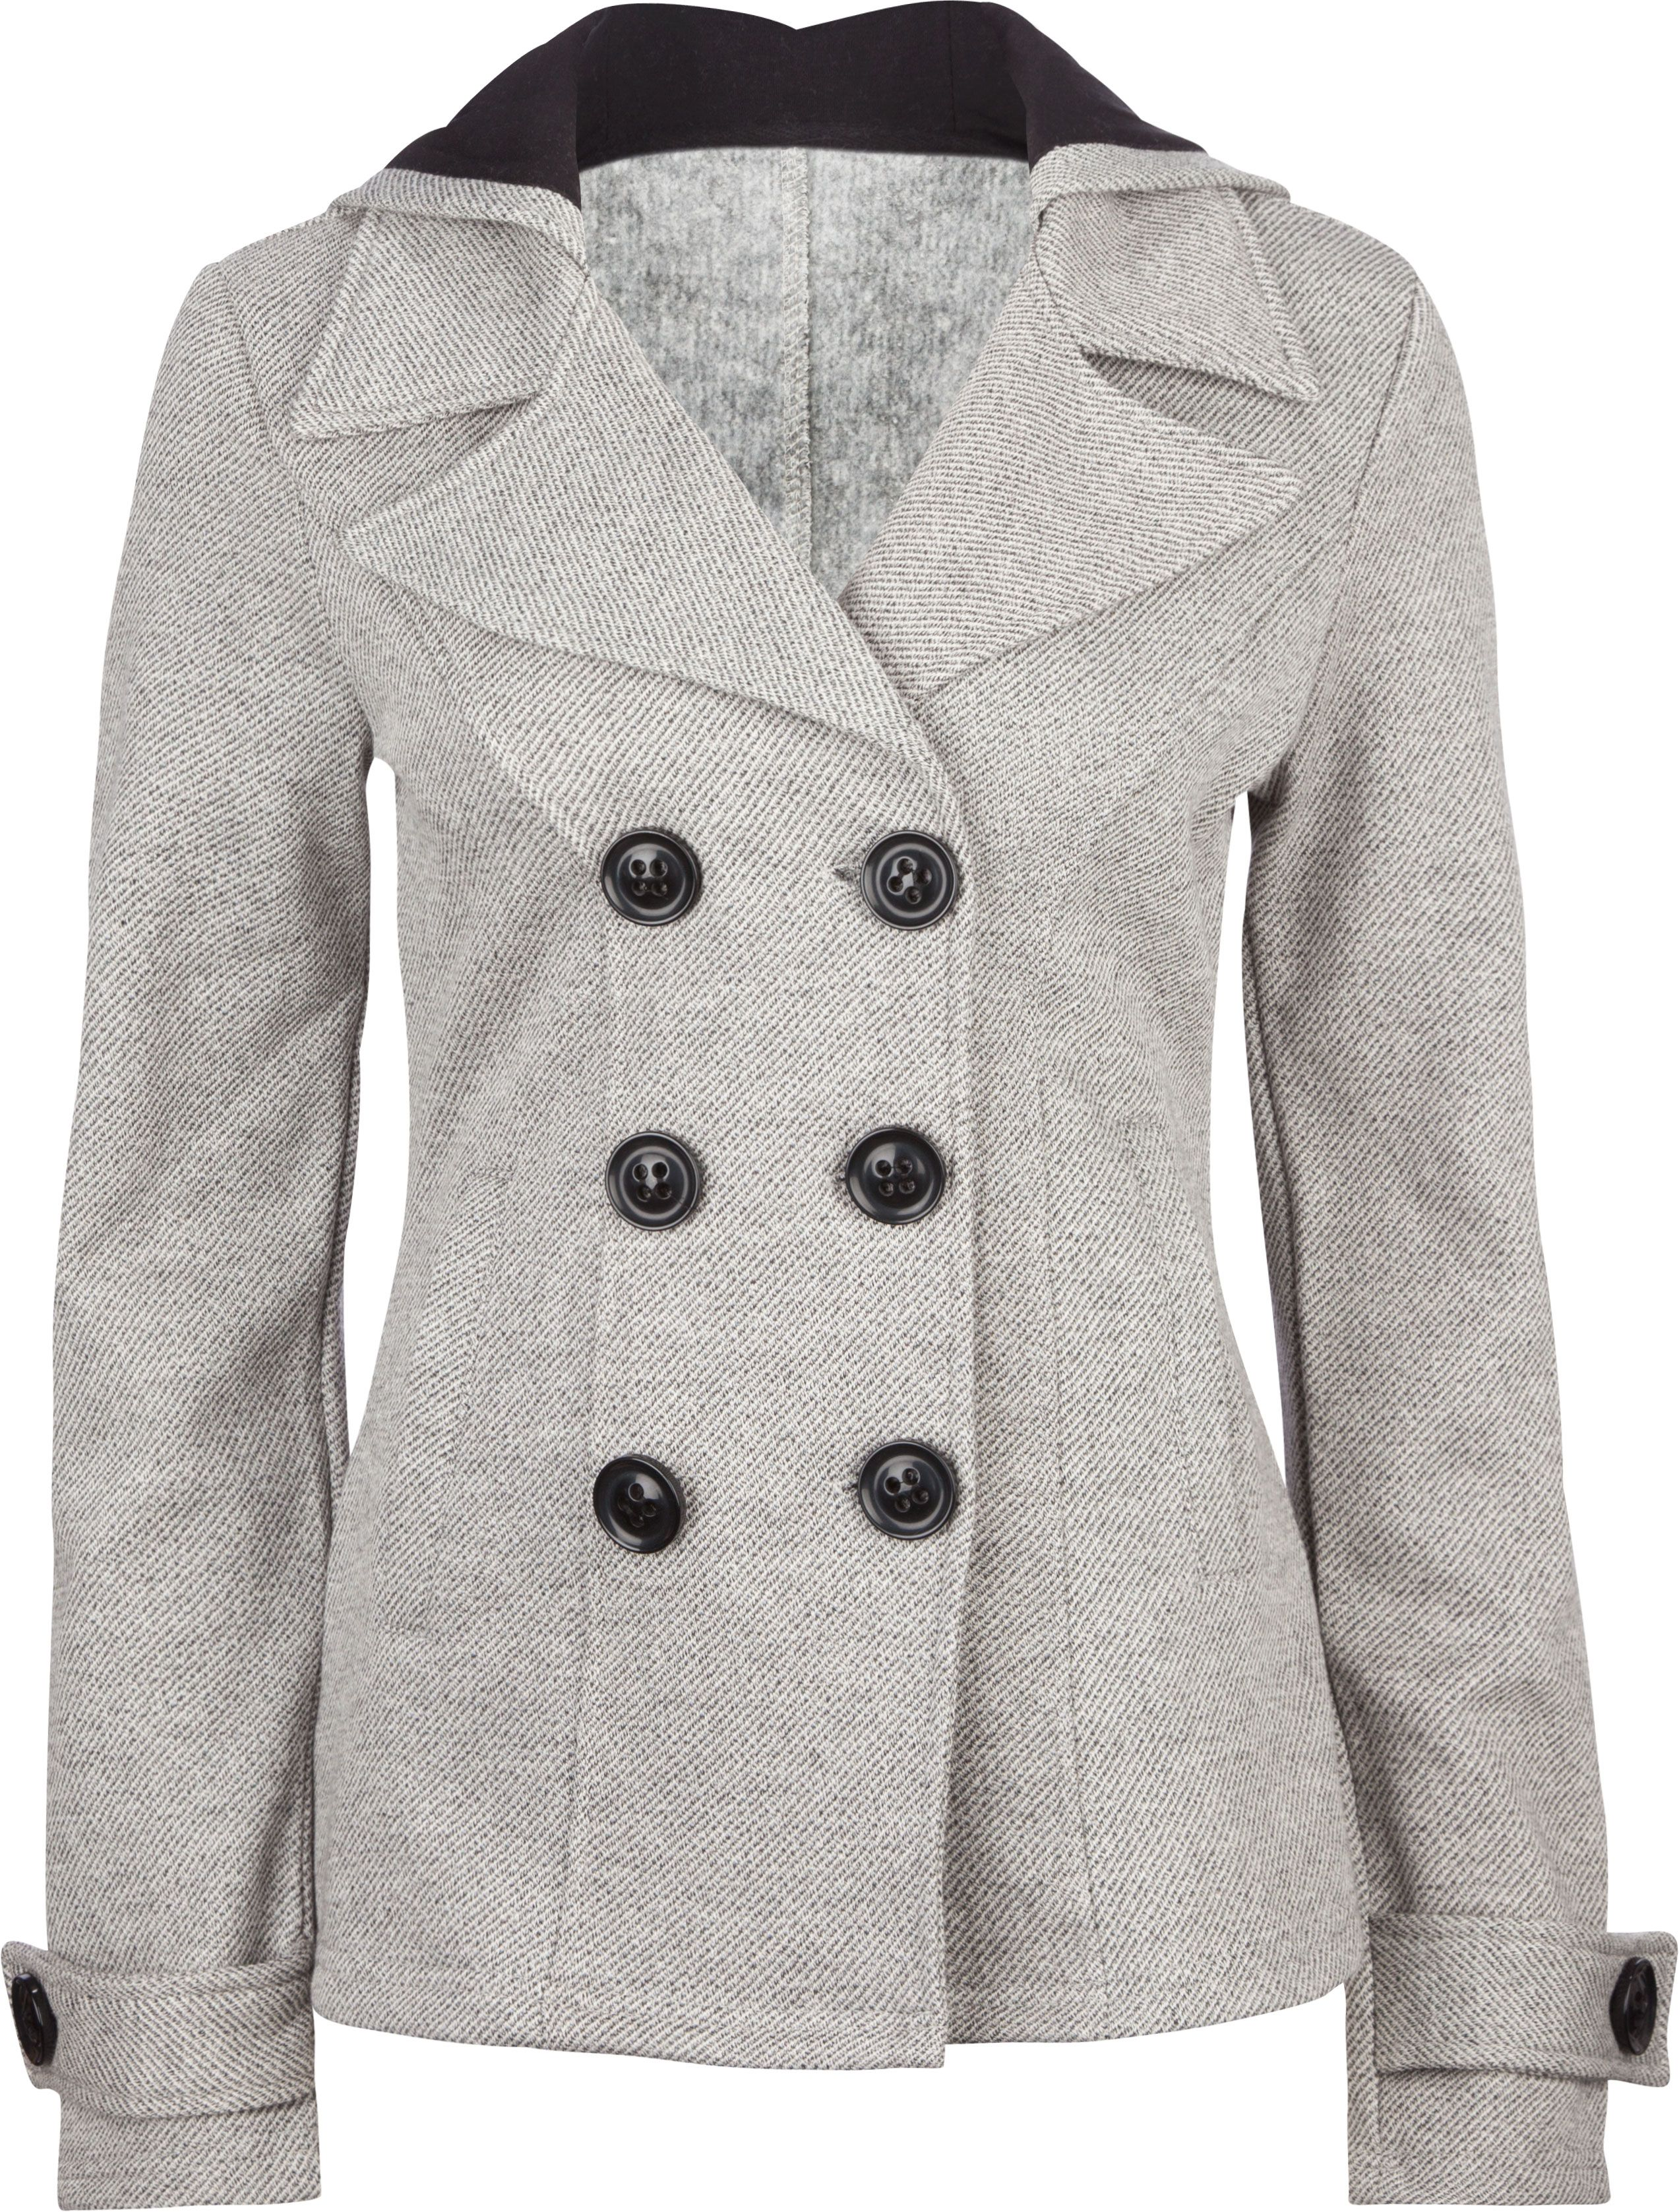 Full Tilt Twill Womens Peacoat 203596125 Jackets Tillys Com Pea Coats Women Womens Pea Coat Jackets Peacoat [ 3354 x 2546 Pixel ]